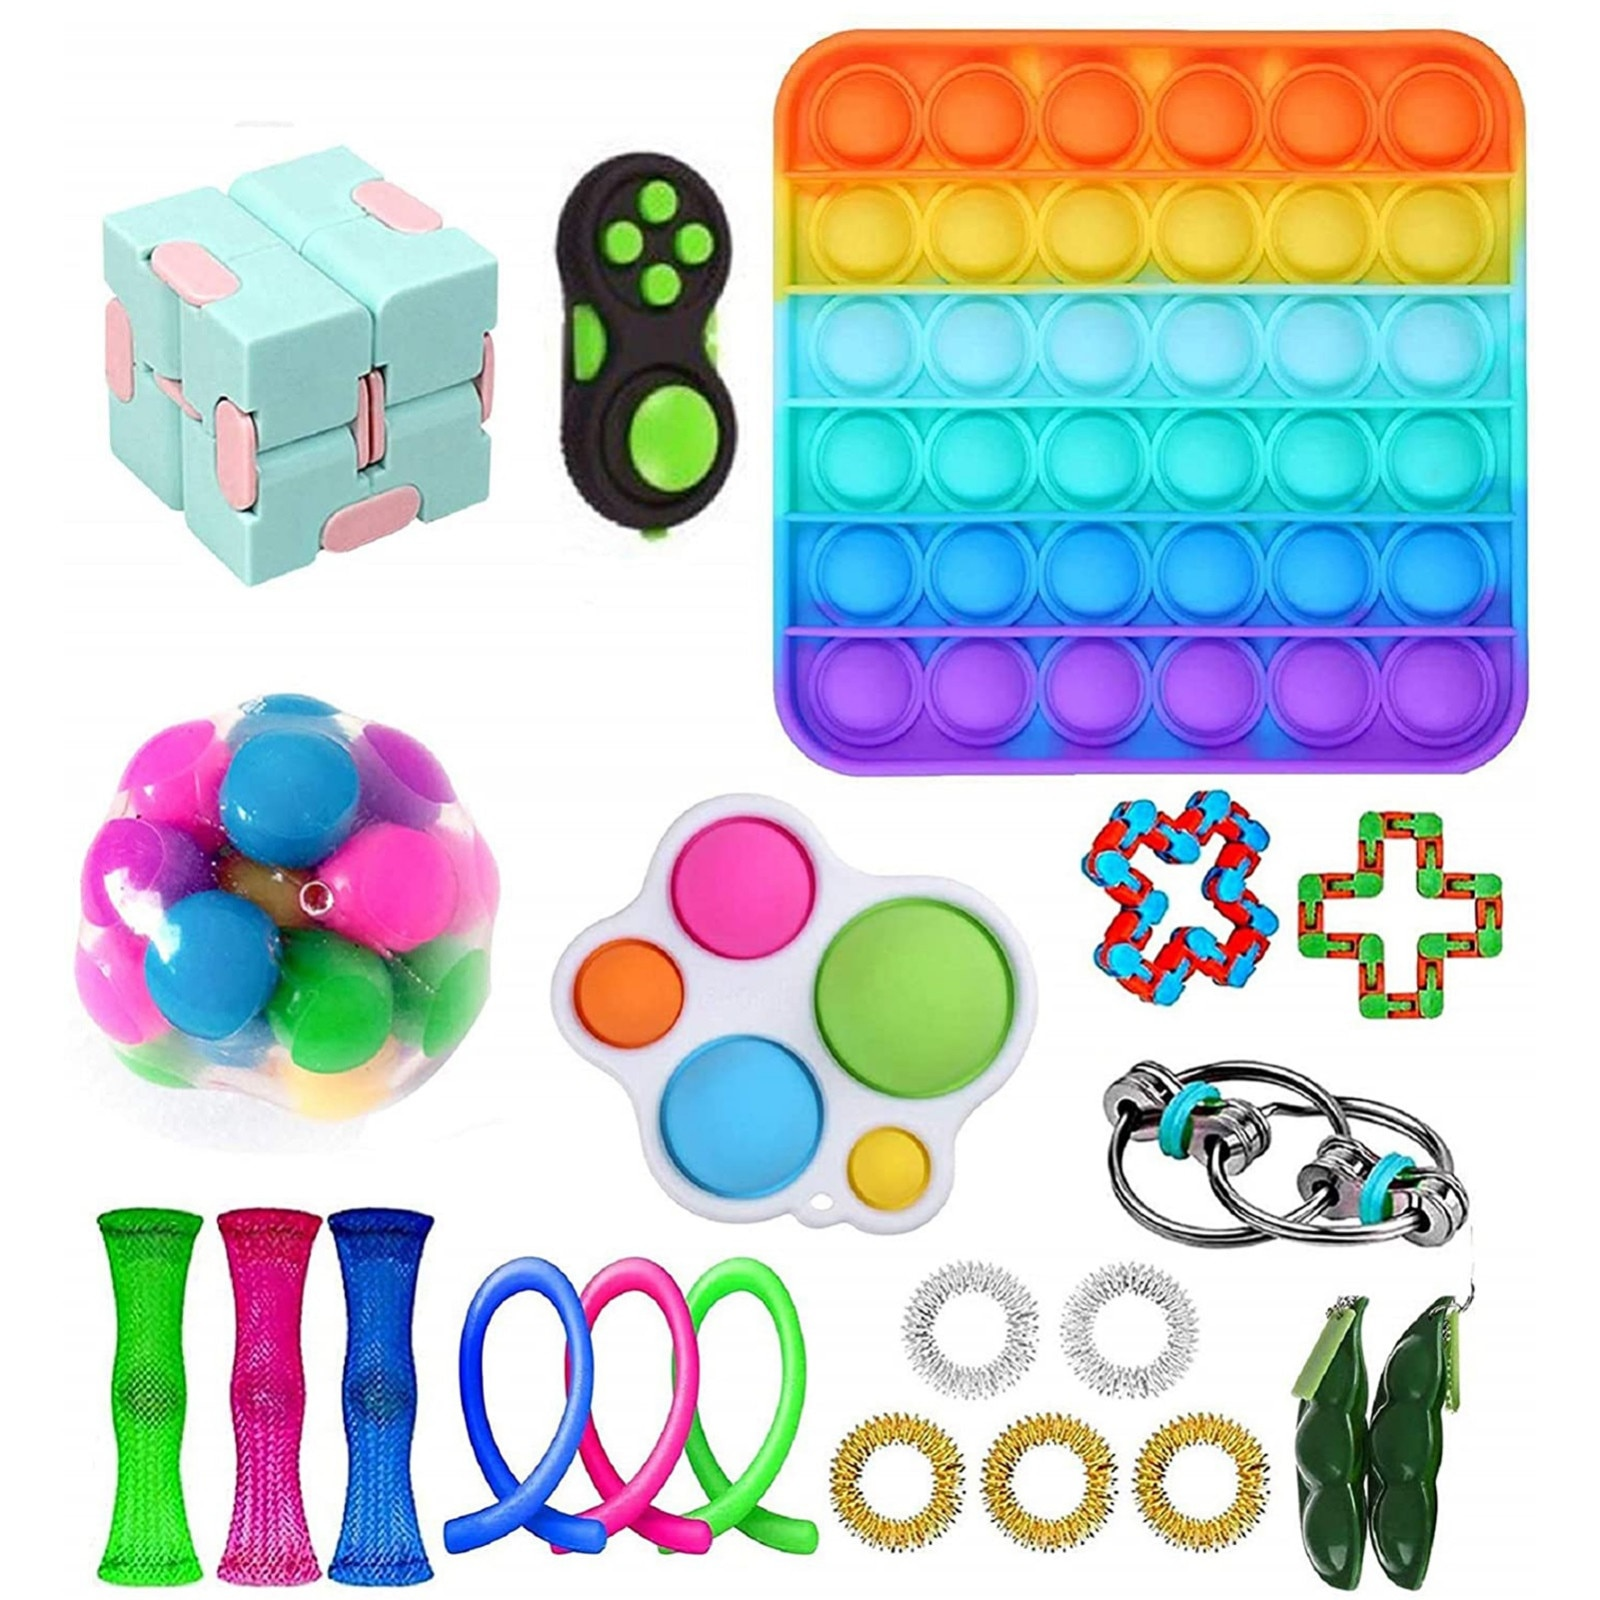 Rainbow Among Pops It Fidget Sensory Toy Pack Set Stress Sensory Toy Set Push Bubble For Children Adults Children's Day Gift enlarge